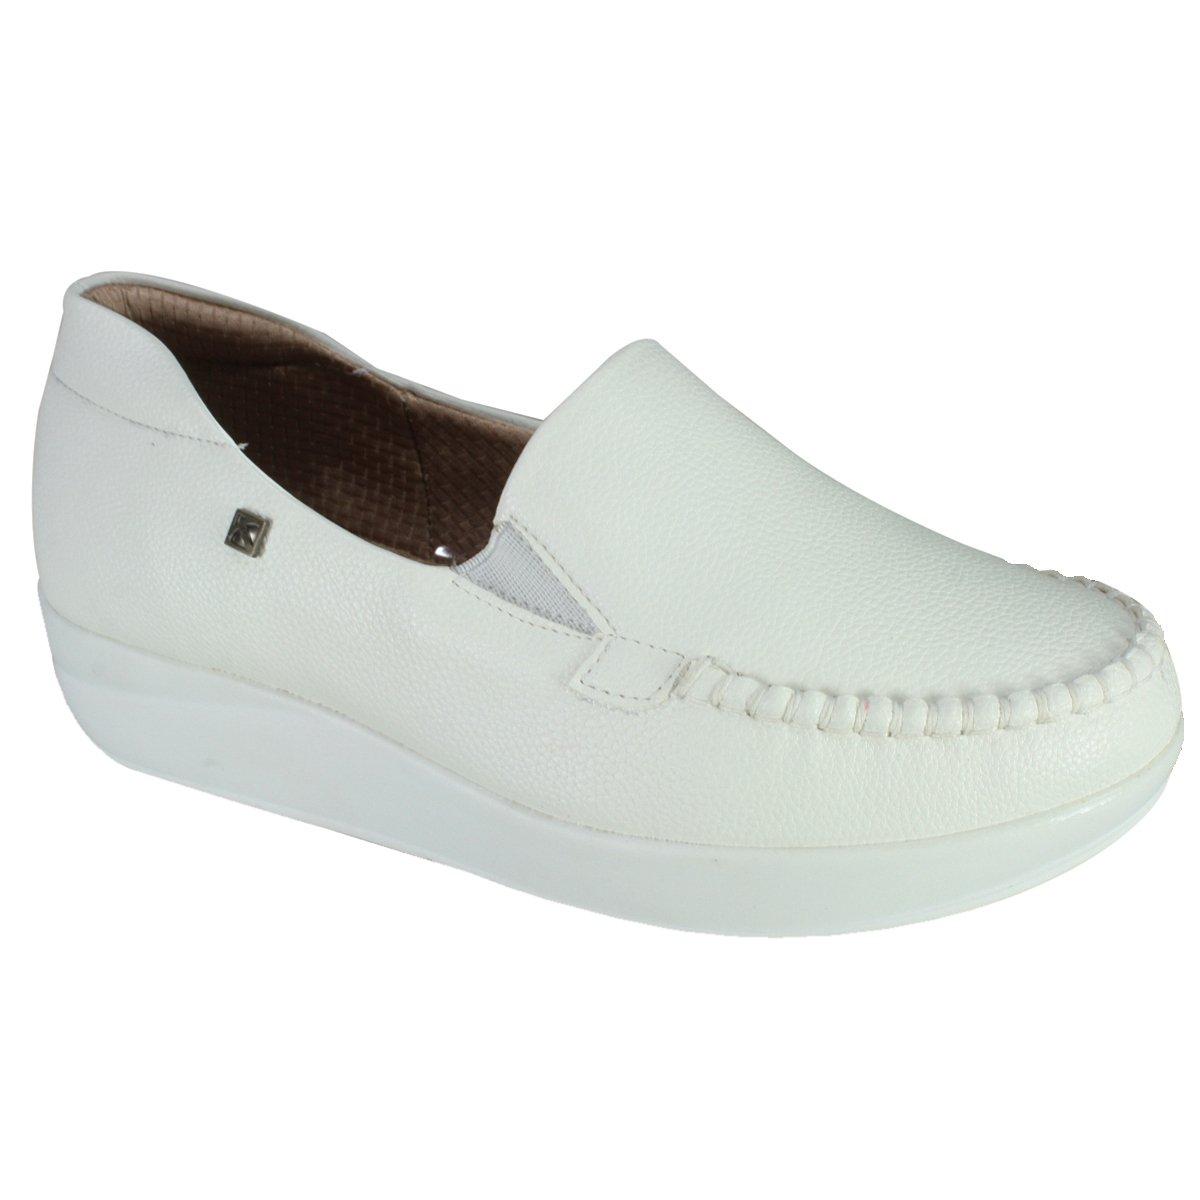 828ac299d6 Sapato Piccadilly Feminino 214019 - Branco (Relax) - Calçados Online ...